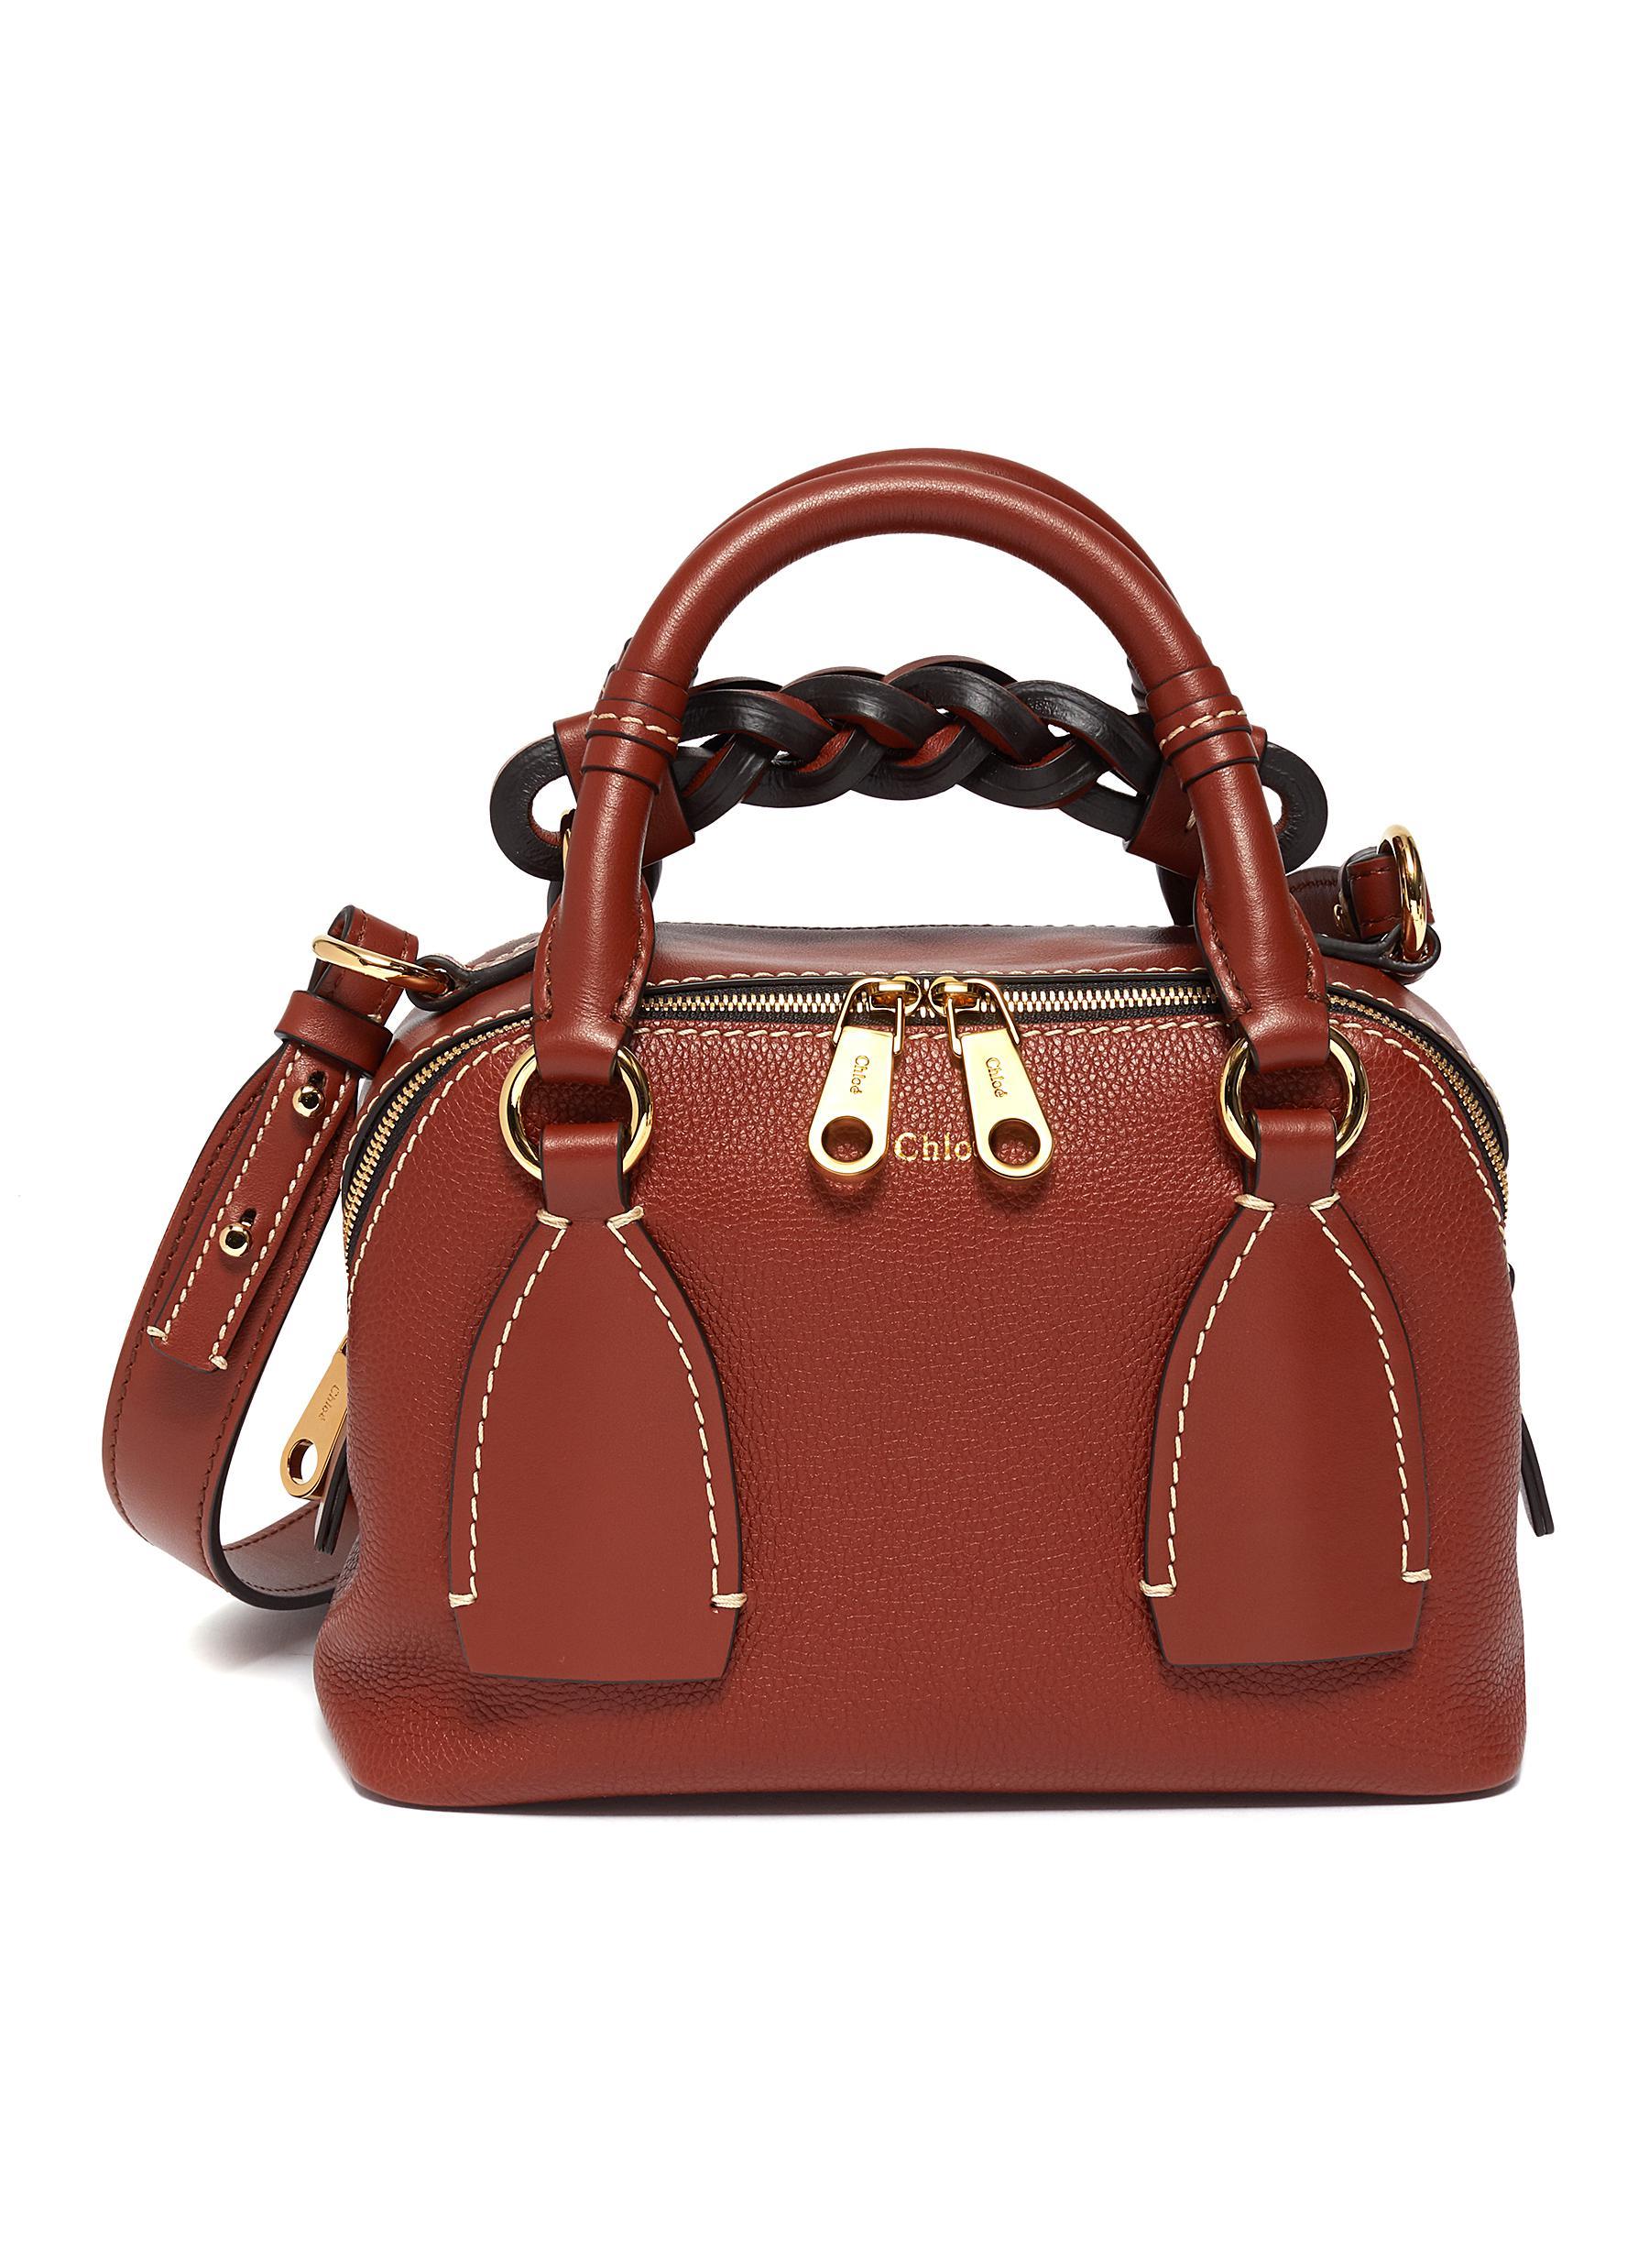 Chloé 'DARIA' SMALL LEATHER BAG